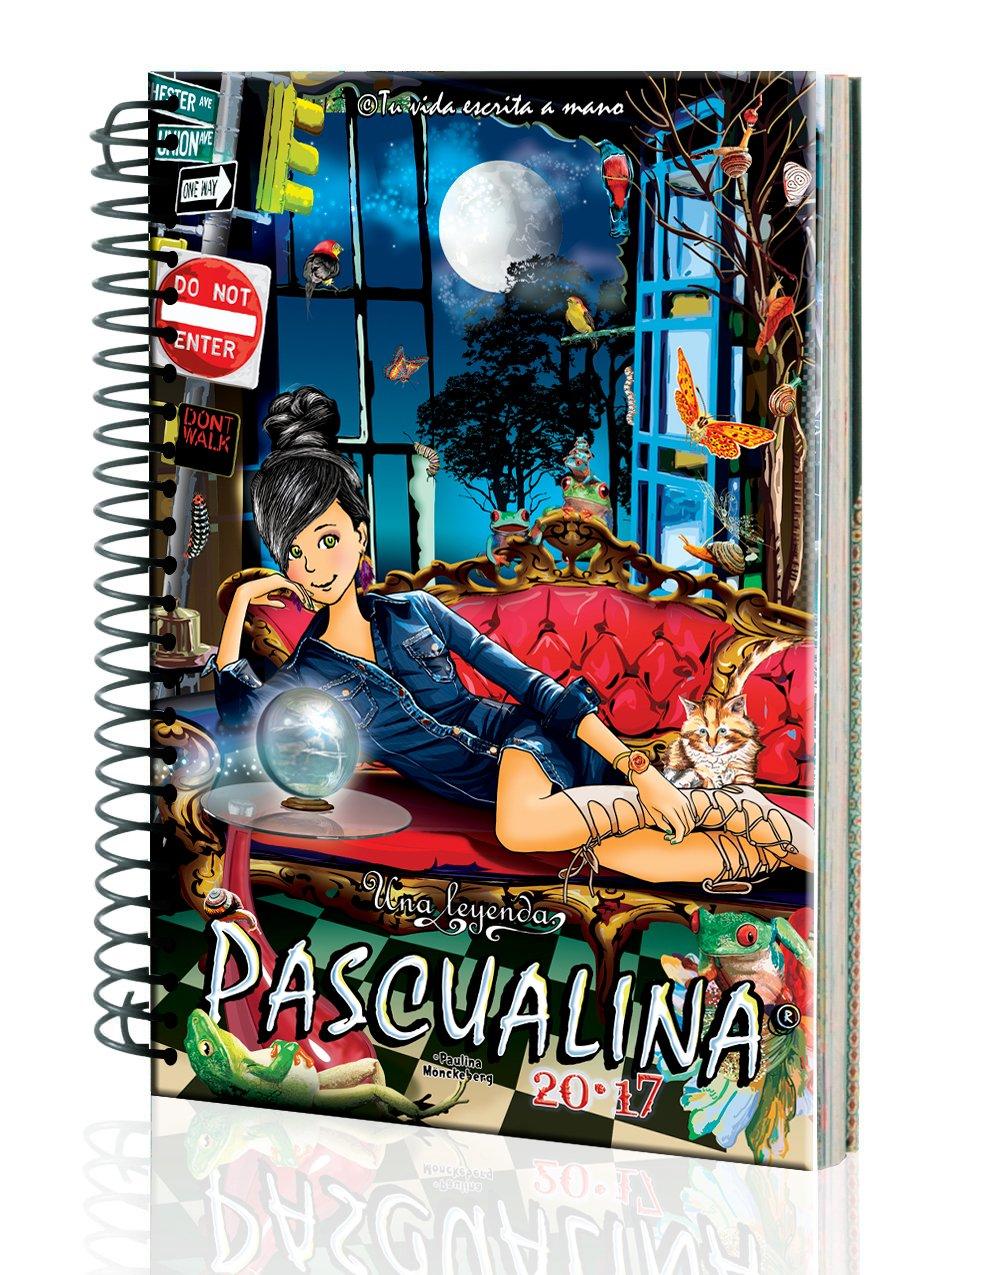 Pascualina 2017 Eclectic Paulina Monckeberg product image